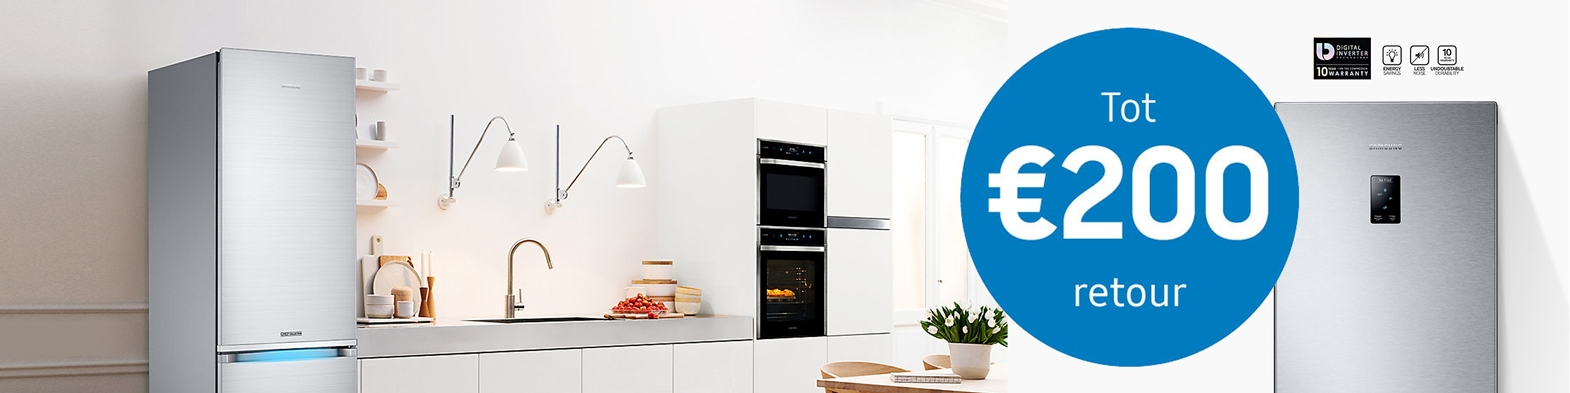 Tot 200,- euro retour | Samsung koel-vriescombinaties en Amerikaanse koelkasten | EP.nl